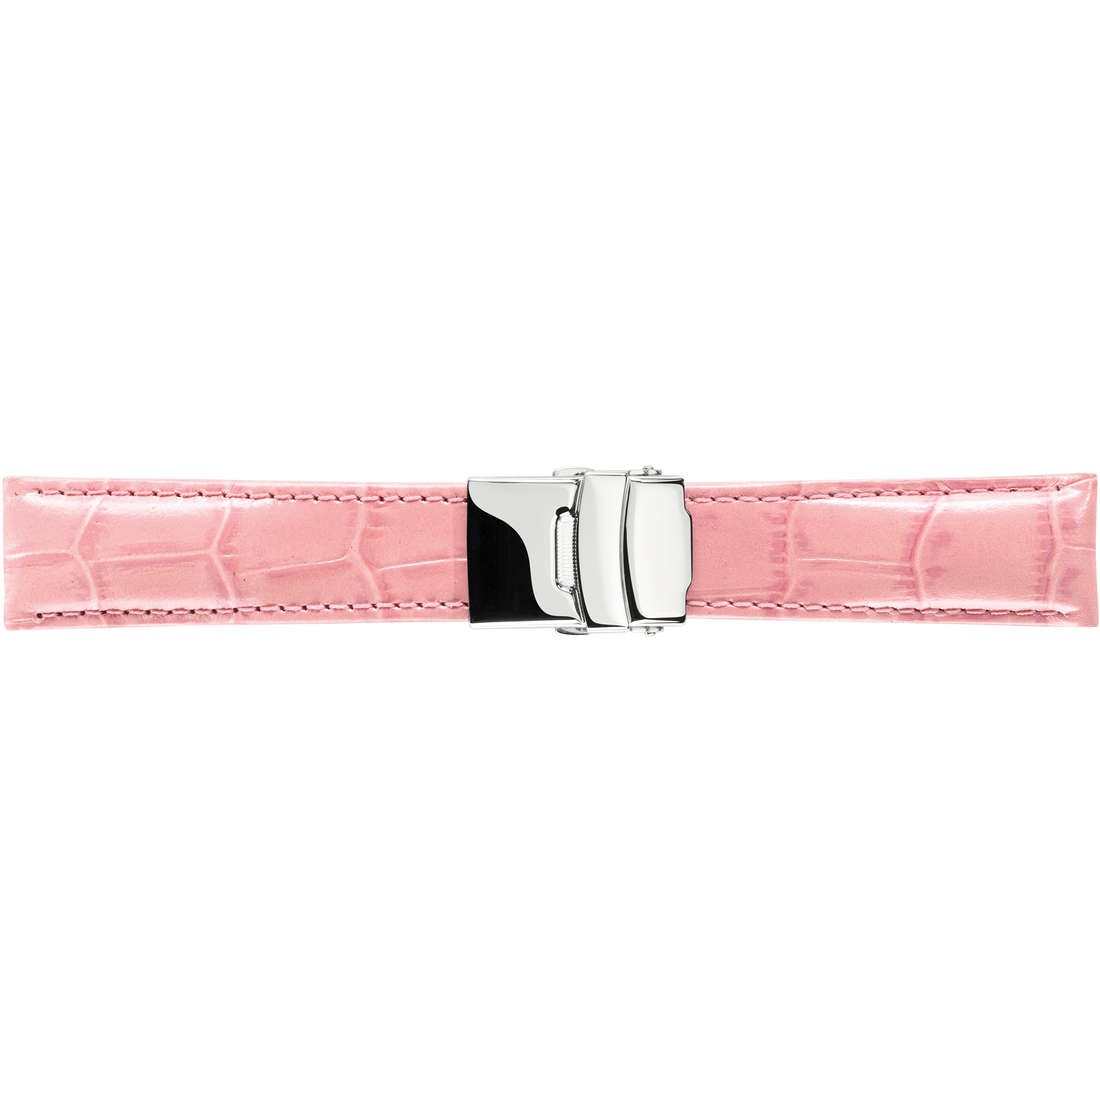 watch watch bands watch straps man Morellato Morellato 1930 A01U3084656187CR20